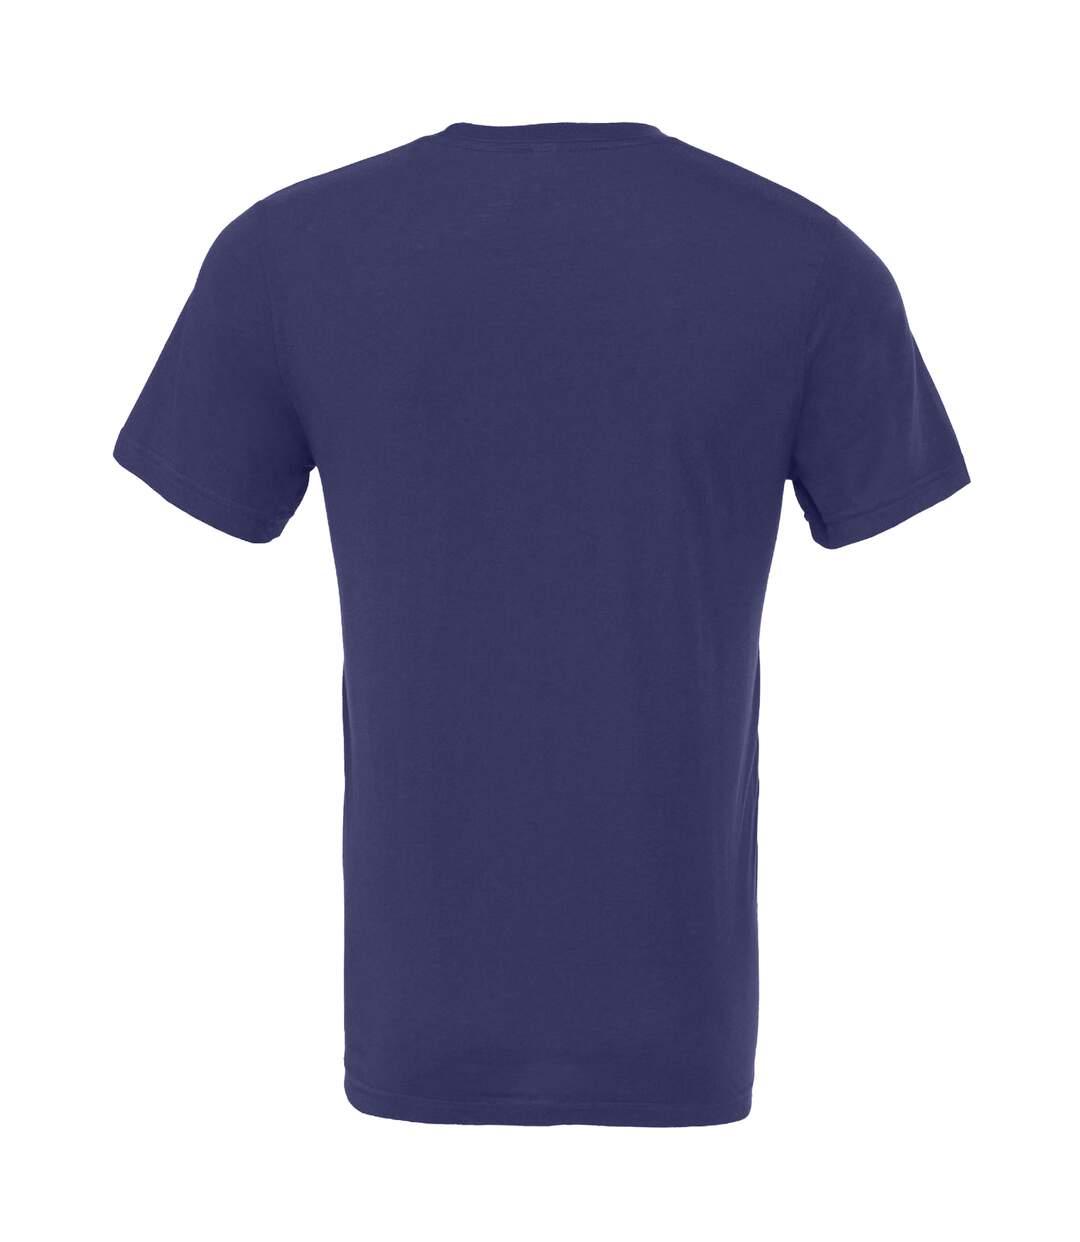 Canvas Unisex Jersey Crew Neck T-Shirt / Mens Short Sleeve T-Shirt (Navy Blue) - UTBC163